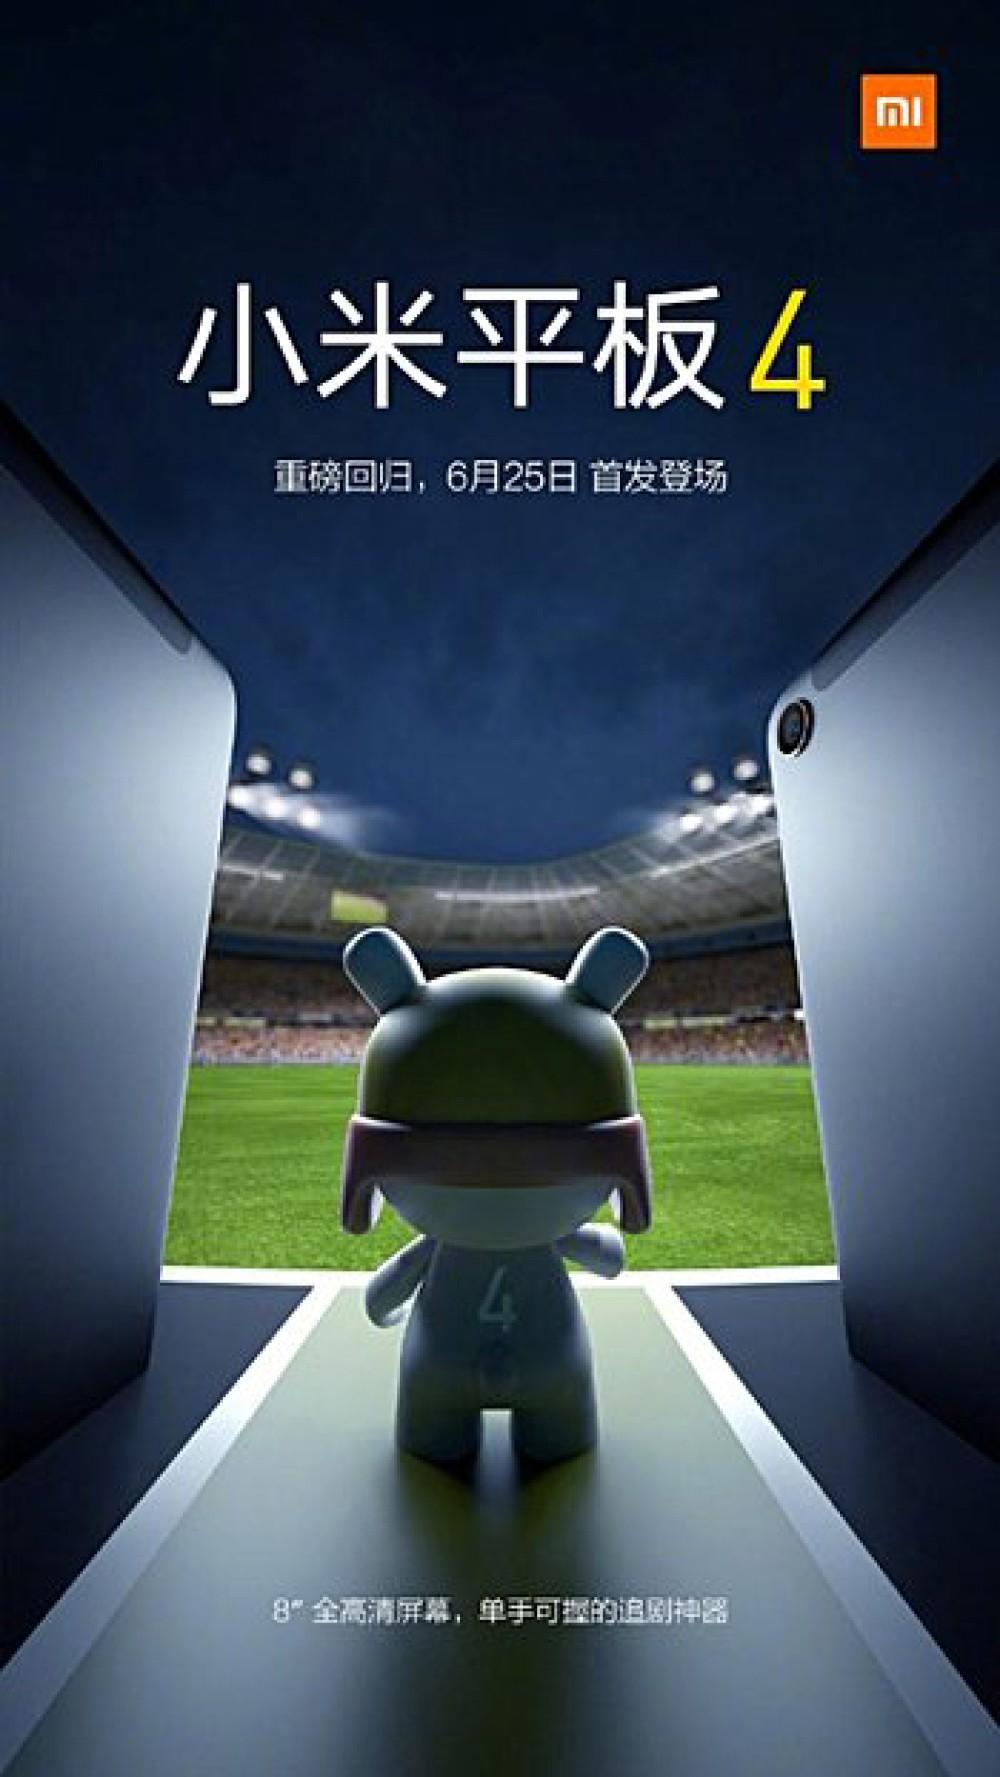 Xiaomi Mi Pad 4: Το νέο tablet της εταιρείας παρουσιάζεται στις 25 Ιουνίου